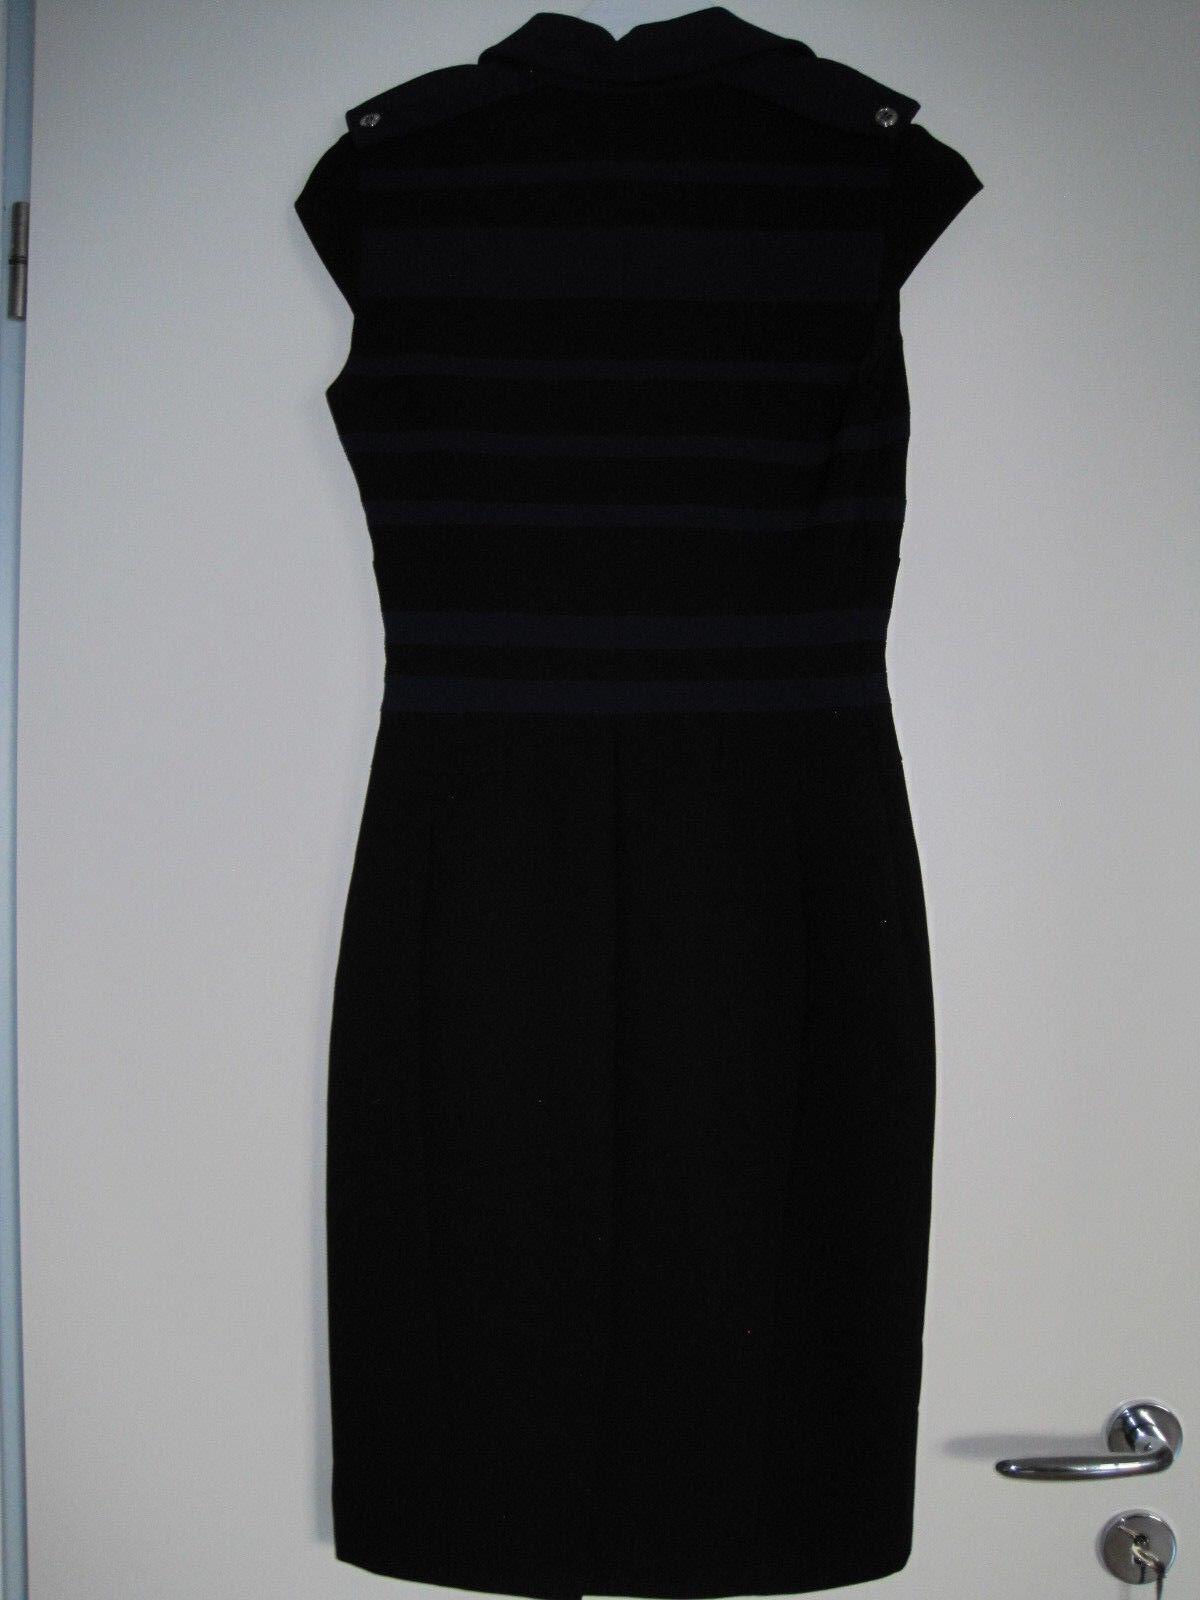 Kleid Karen Millen UK 10 Euro 36 38 Pencil Pencil Pencil Dress Buisiness edel 408d51